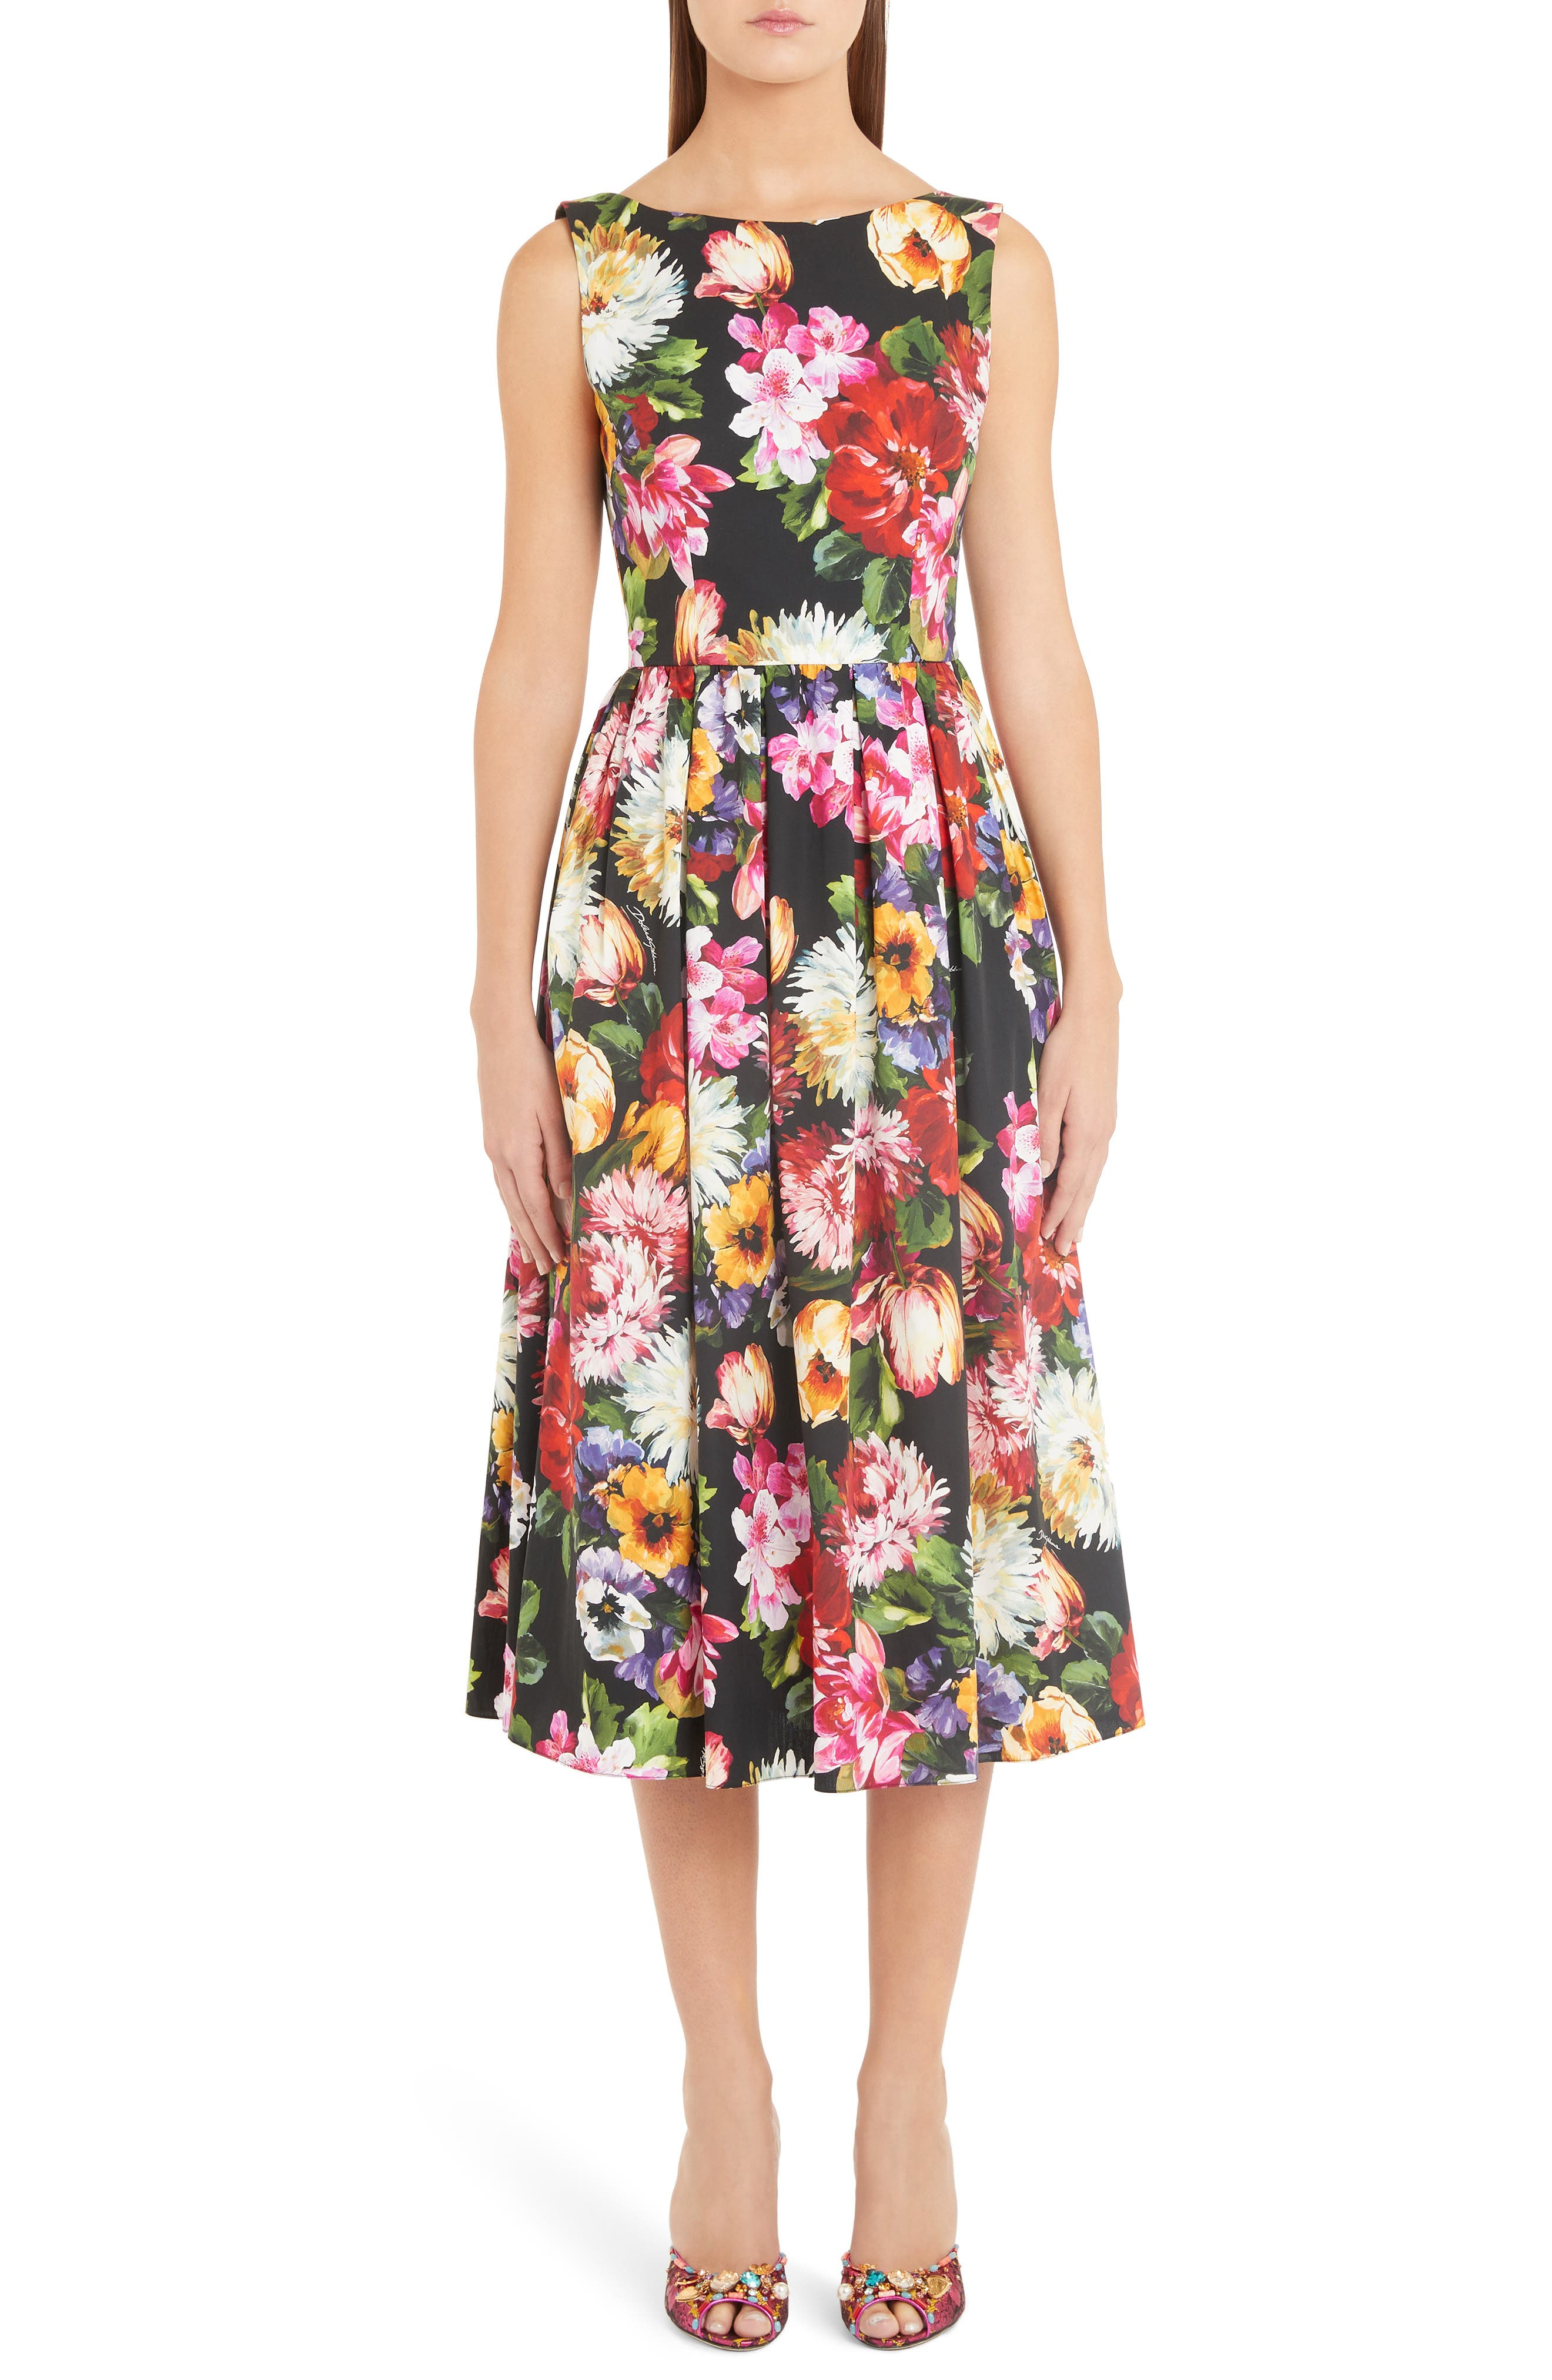 Dolce & gabbana Floral Print A-Line Midi Dress, US / 44 IT - Black